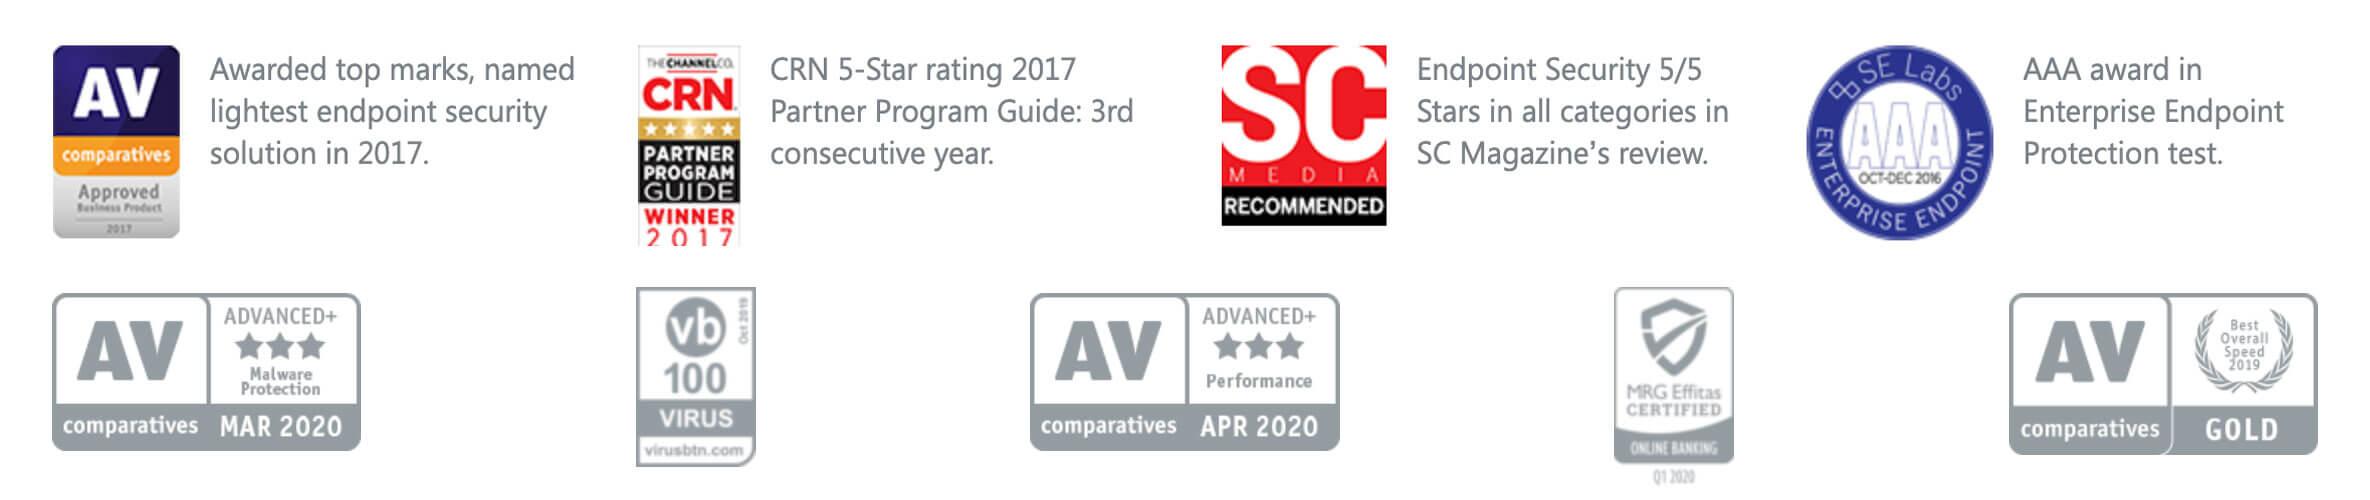 ESET-certification-awards